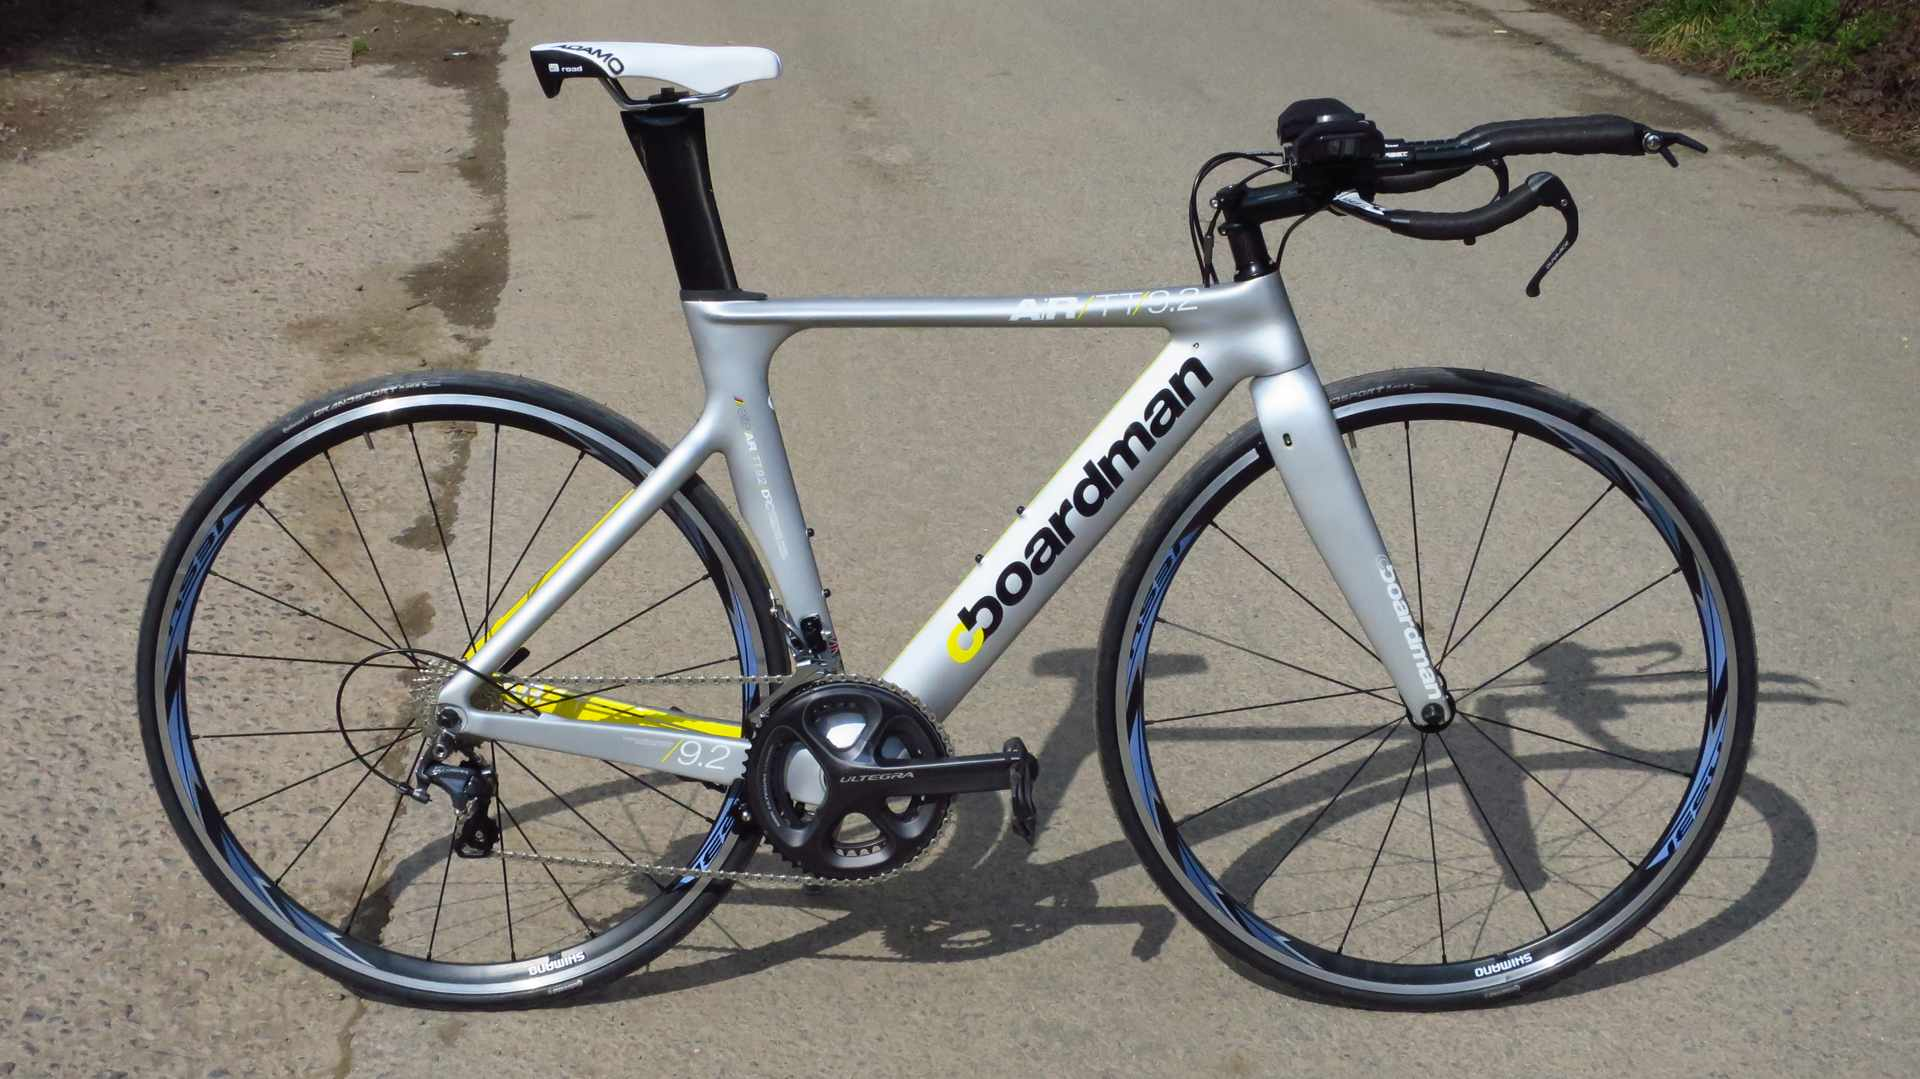 The Boardman AiR/TT 9.2 time trial / triathlon bike in its striking silver paintjob